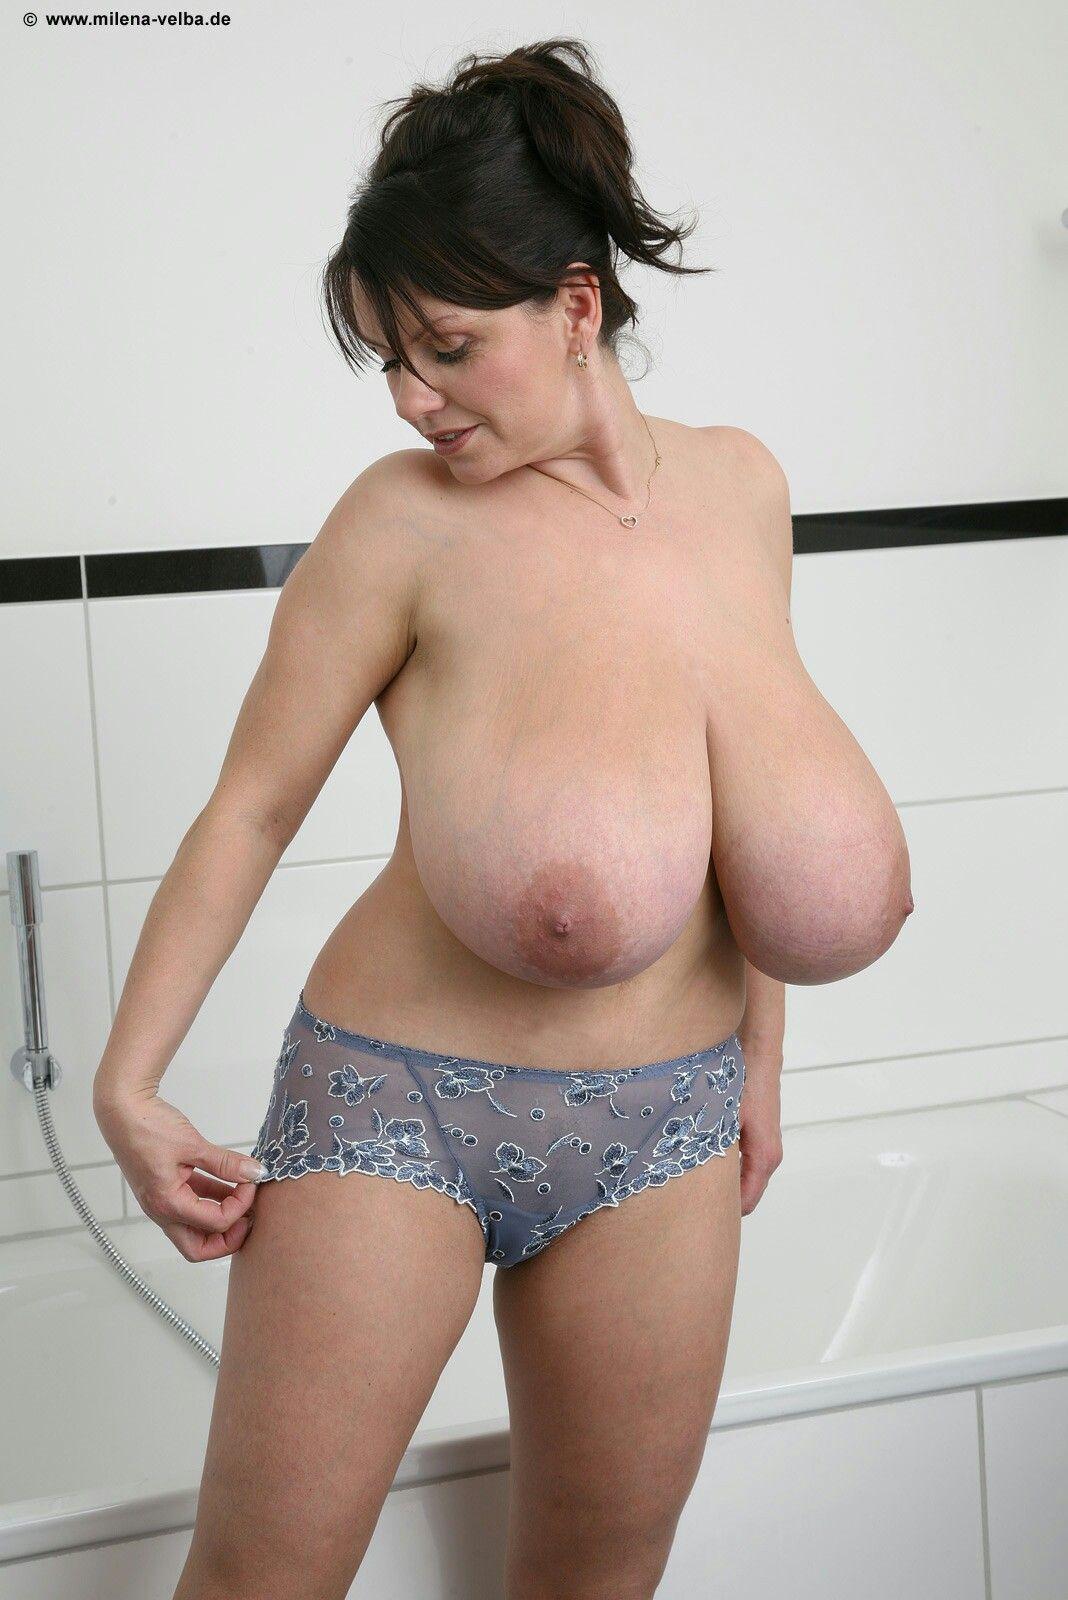 Julia benson nude video